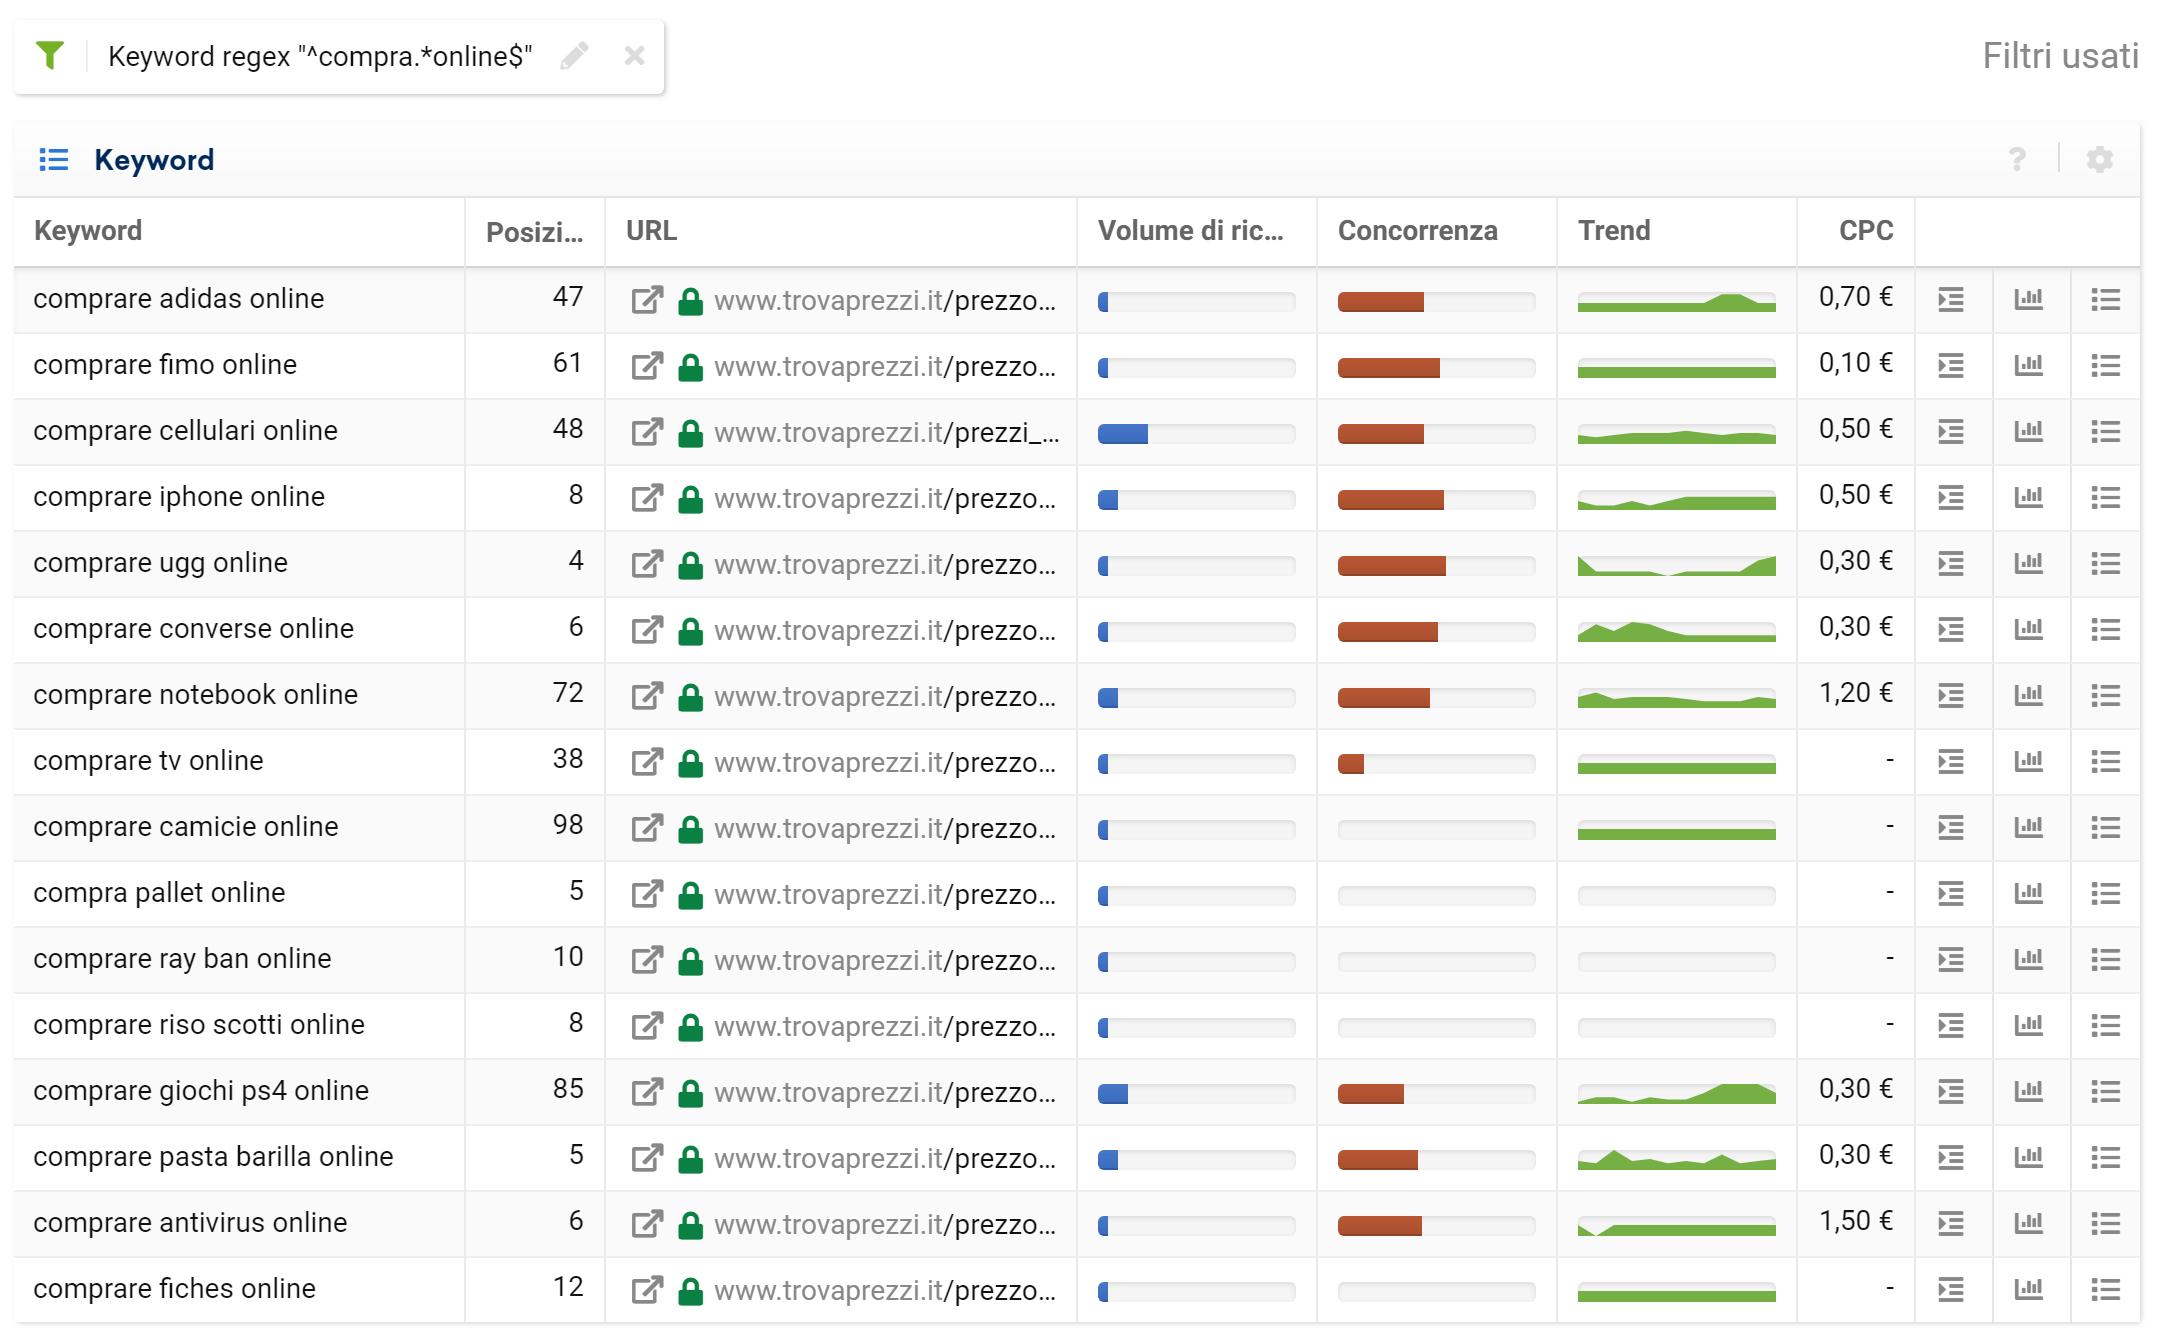 Toolbox SISTRIX: regex per keyword specifiche